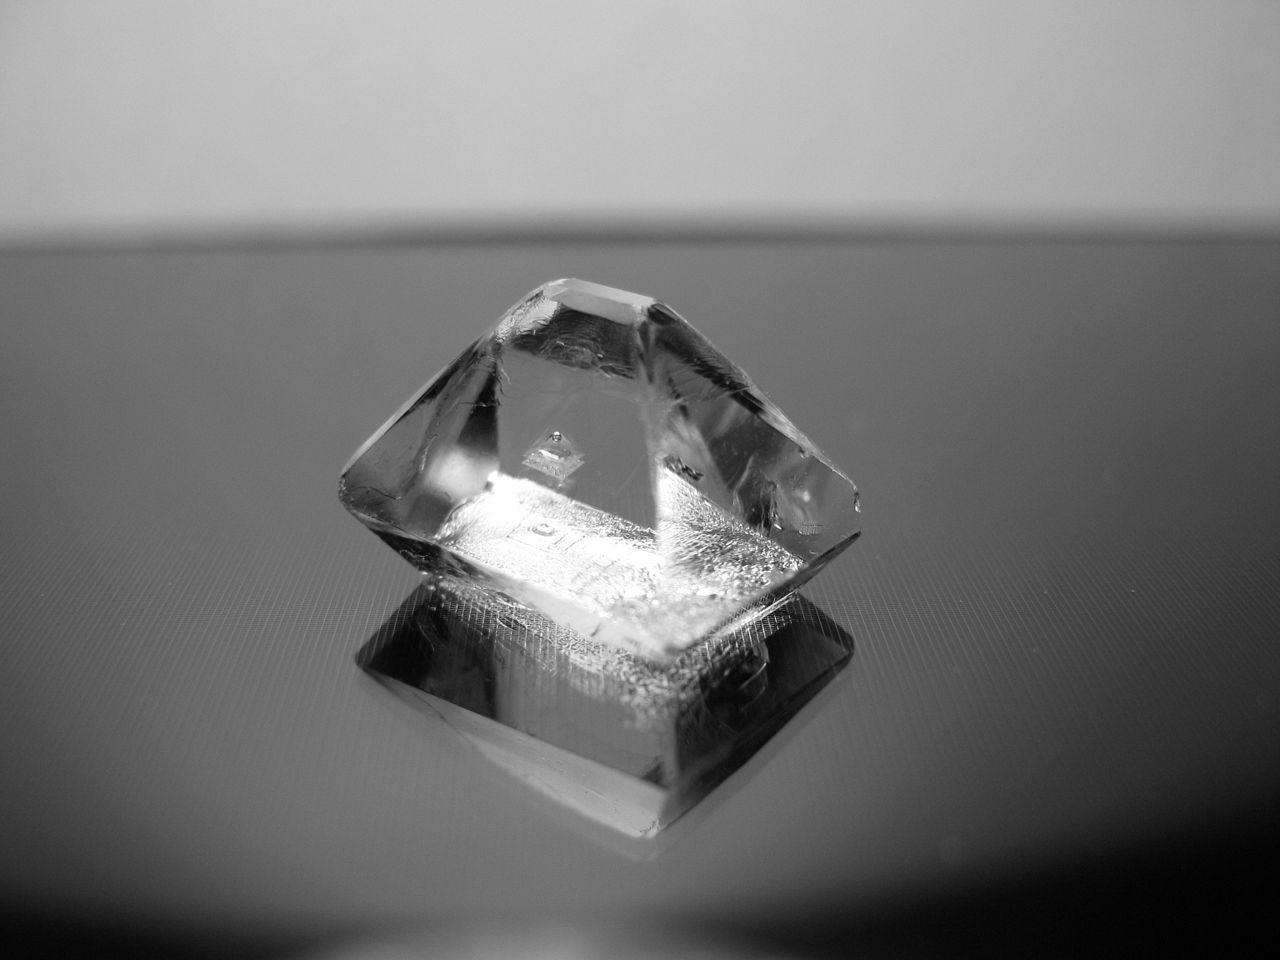 A potassium alum crystal